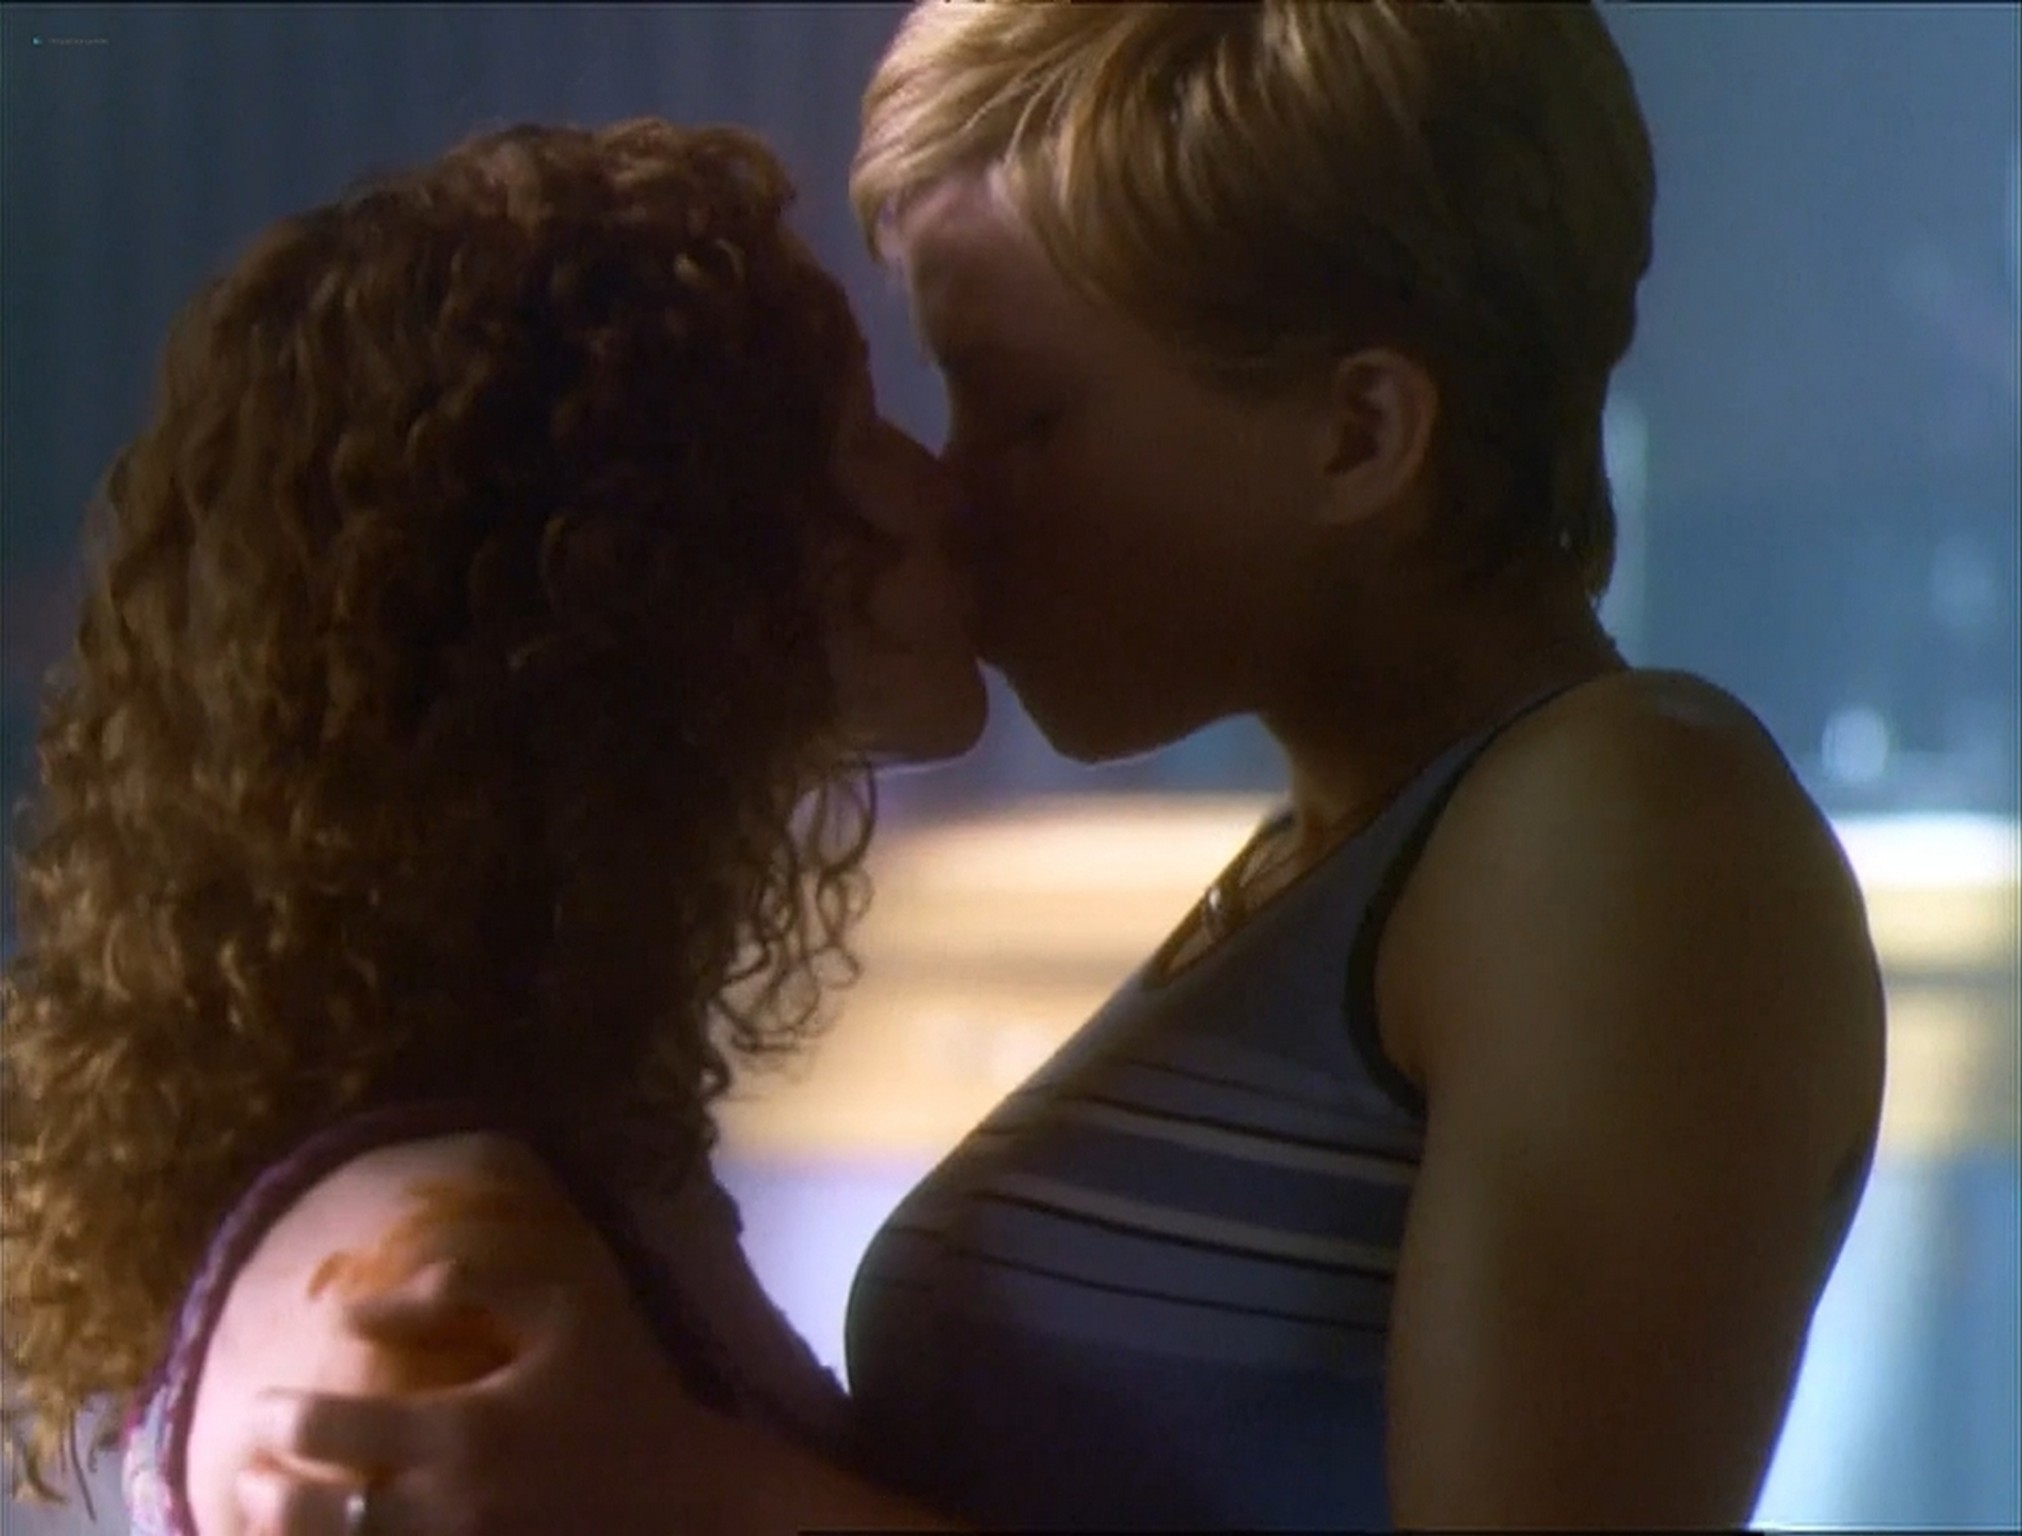 Christina Cox nude bush lesbian sex with Karyn Dwyer nude too Better than Chocolate 1999 HD 720p WEB DL 2